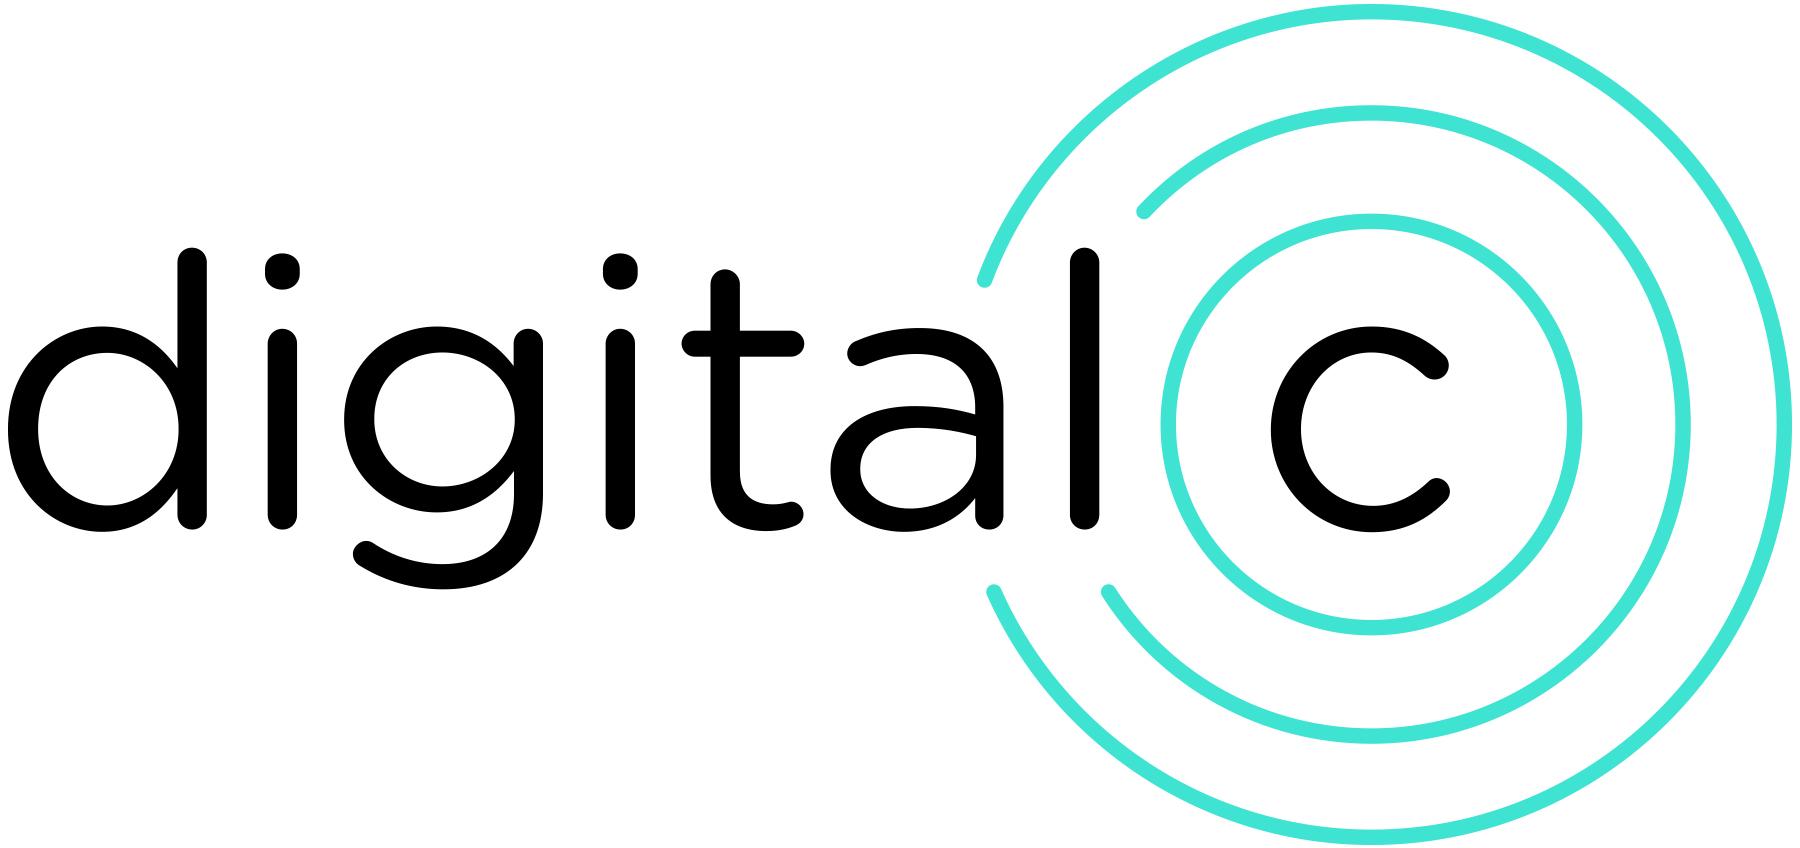 DigitalC_CMYK_HiRes.jpg